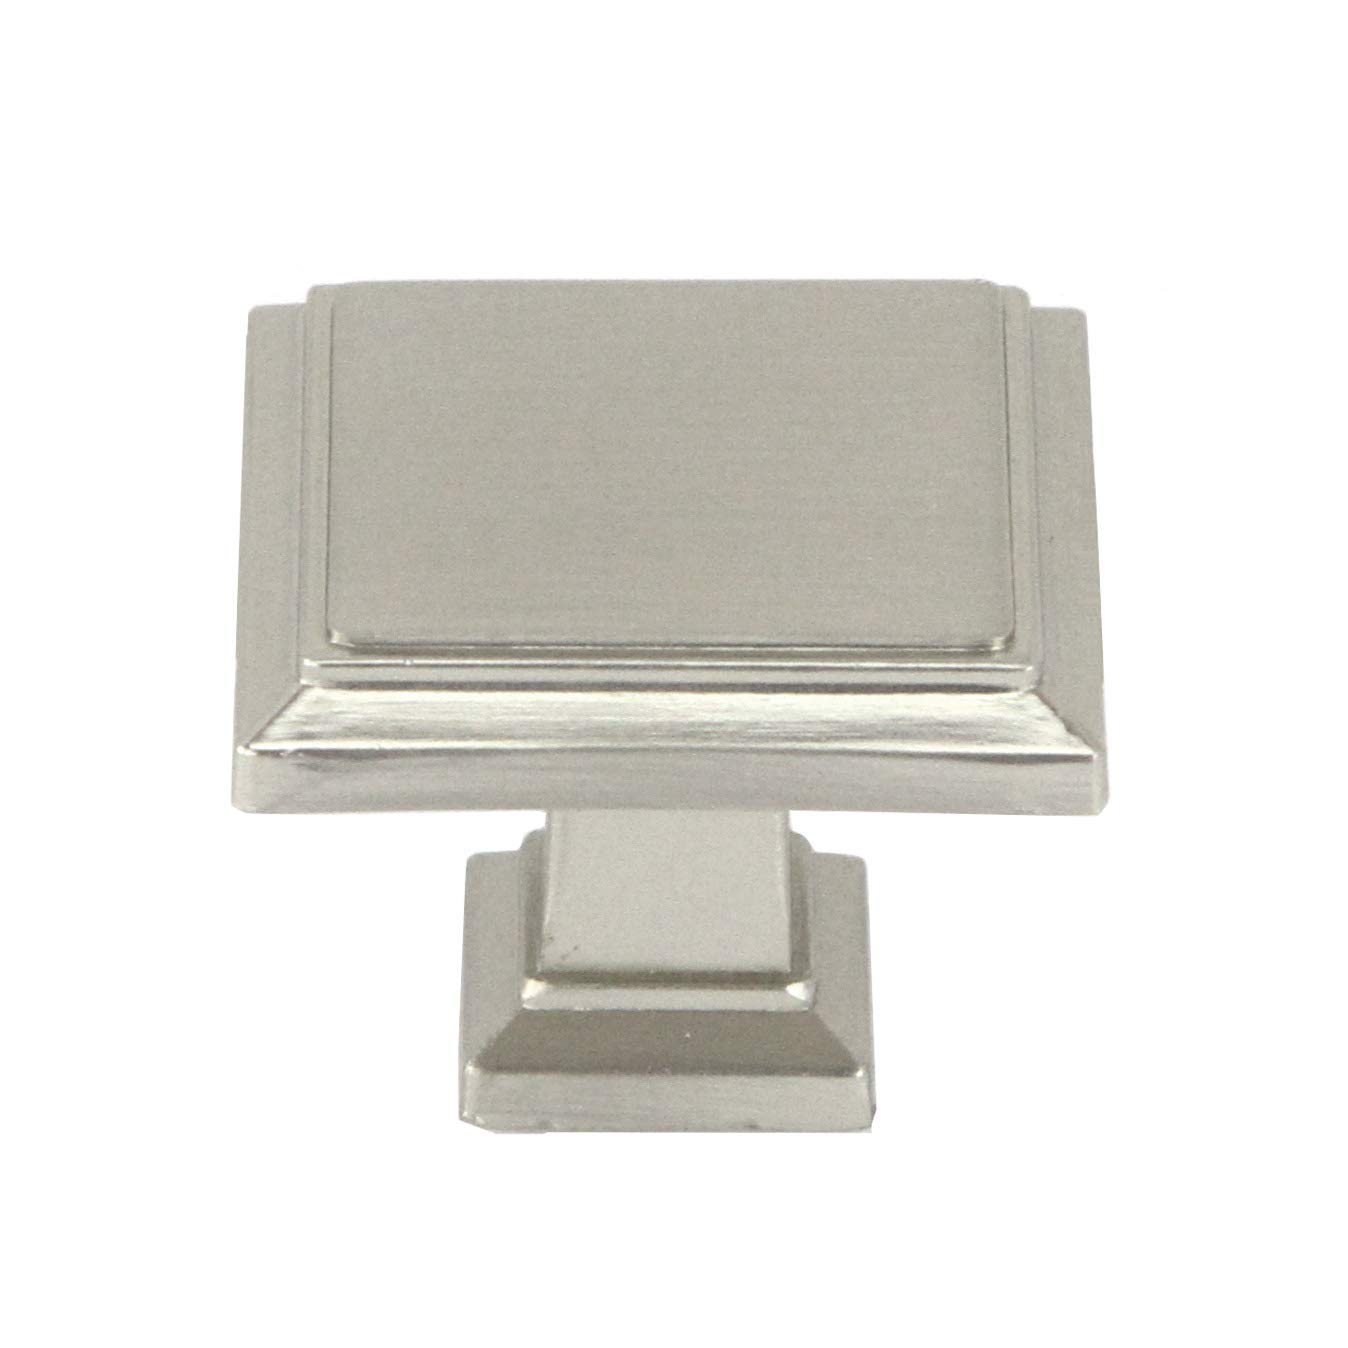 Kingsman Roma Series 1-1/4 in. (32mm) Square Soild Zinc Alloy Cabinet Knob (50, Brushed Nickel)